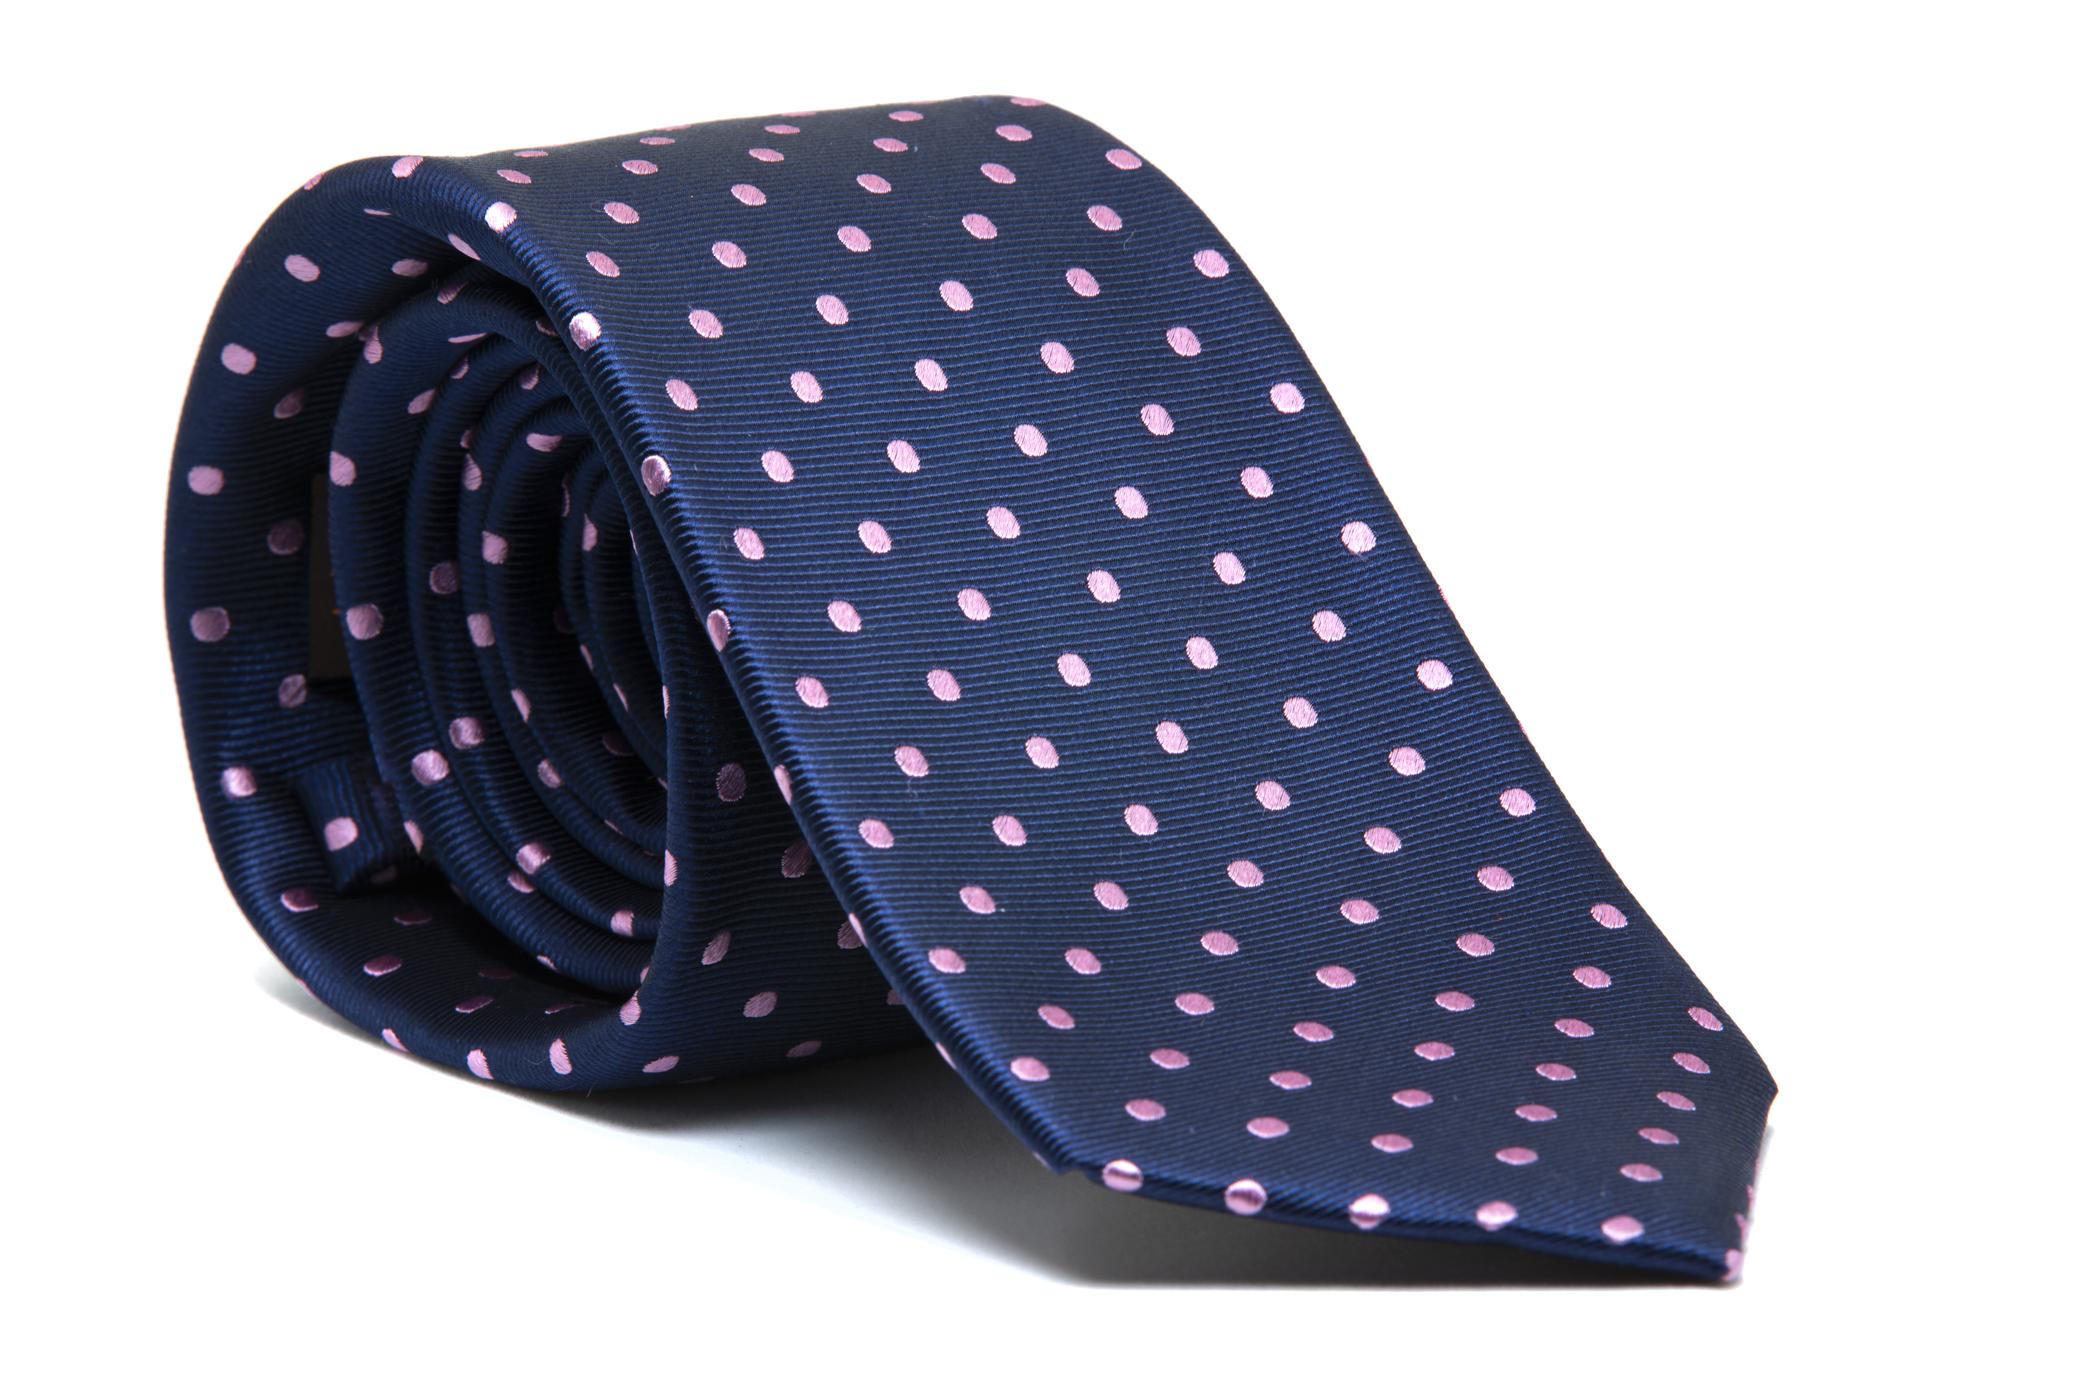 Corbata azul marino topos rosas